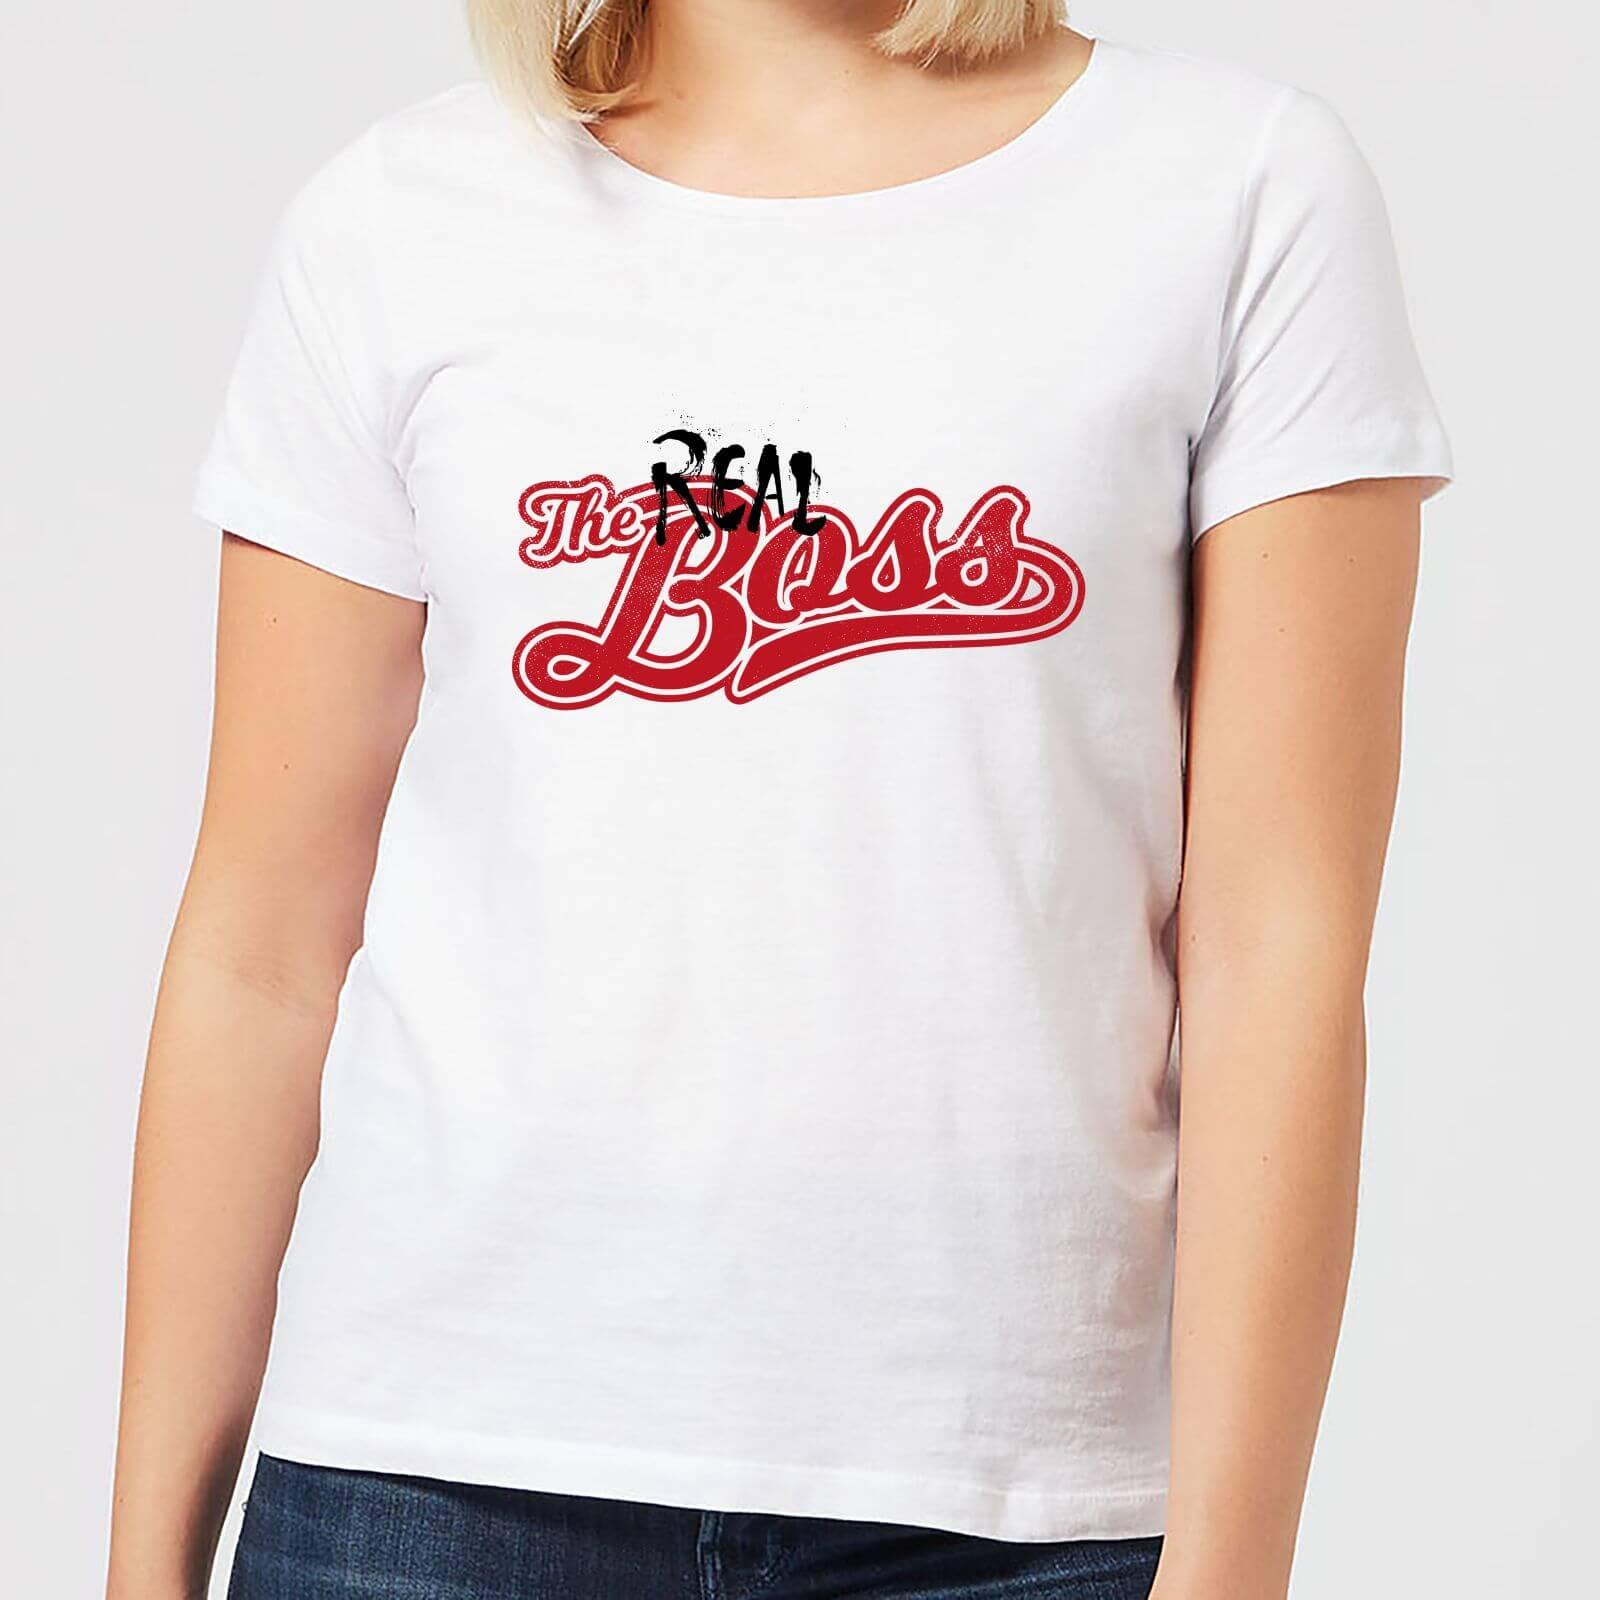 620c8fa0b The Real Boss Women's T-Shirt - White   IWOOT